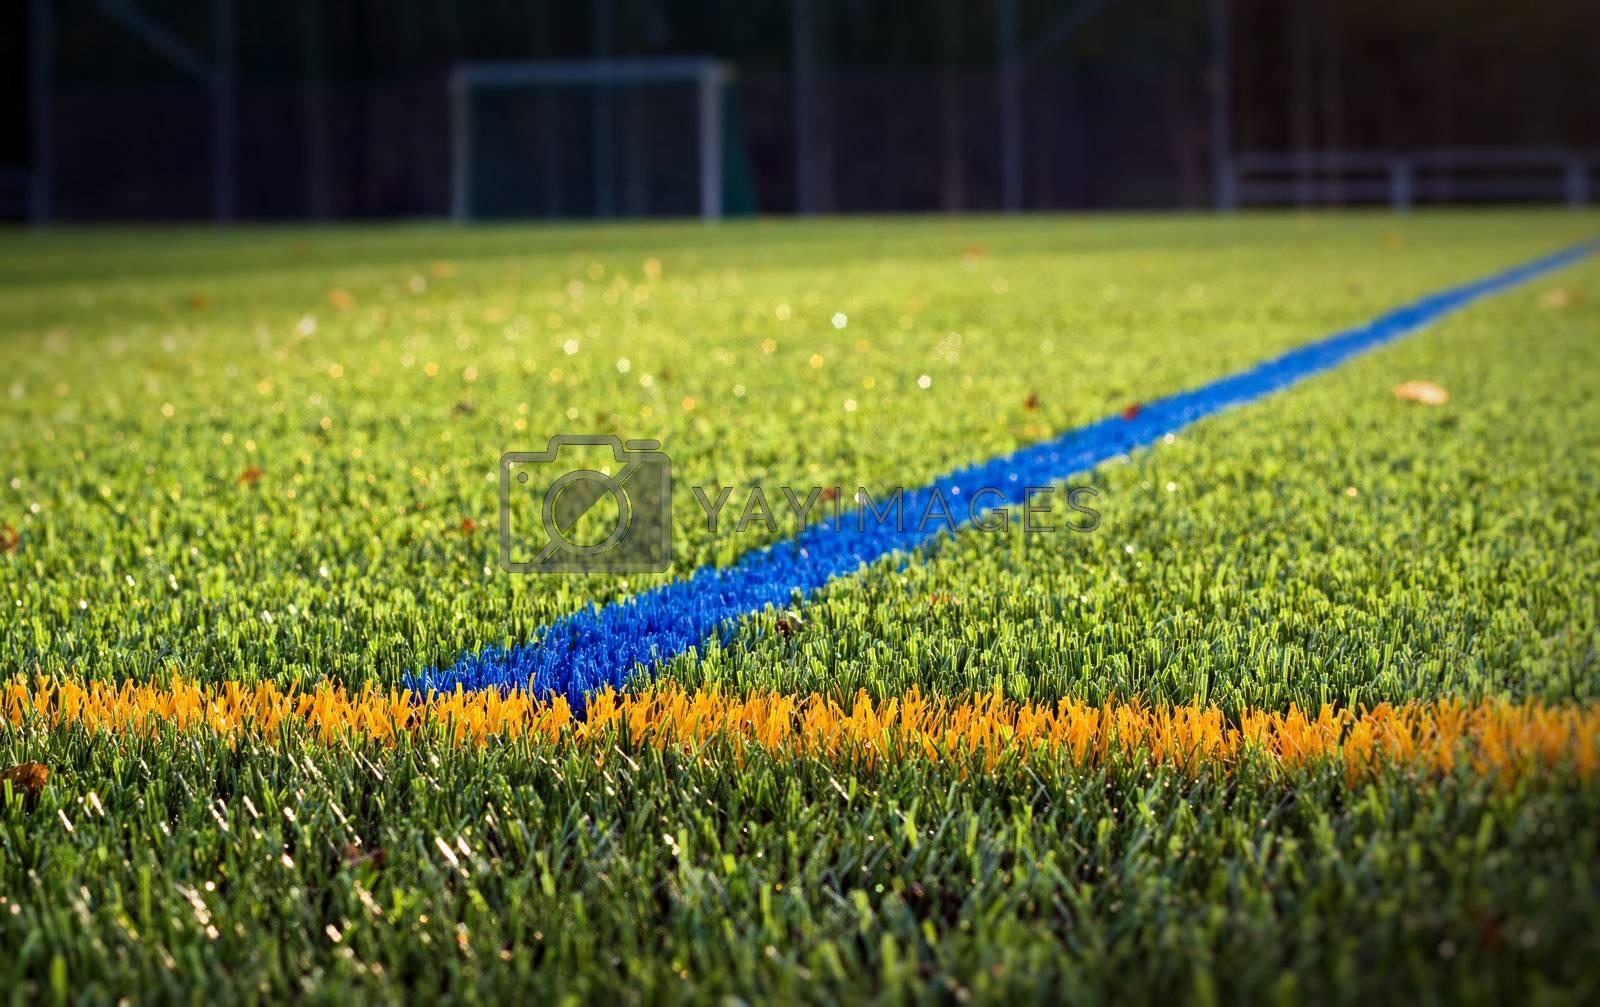 Royalty free image of Soccer Stadium by p0temkin